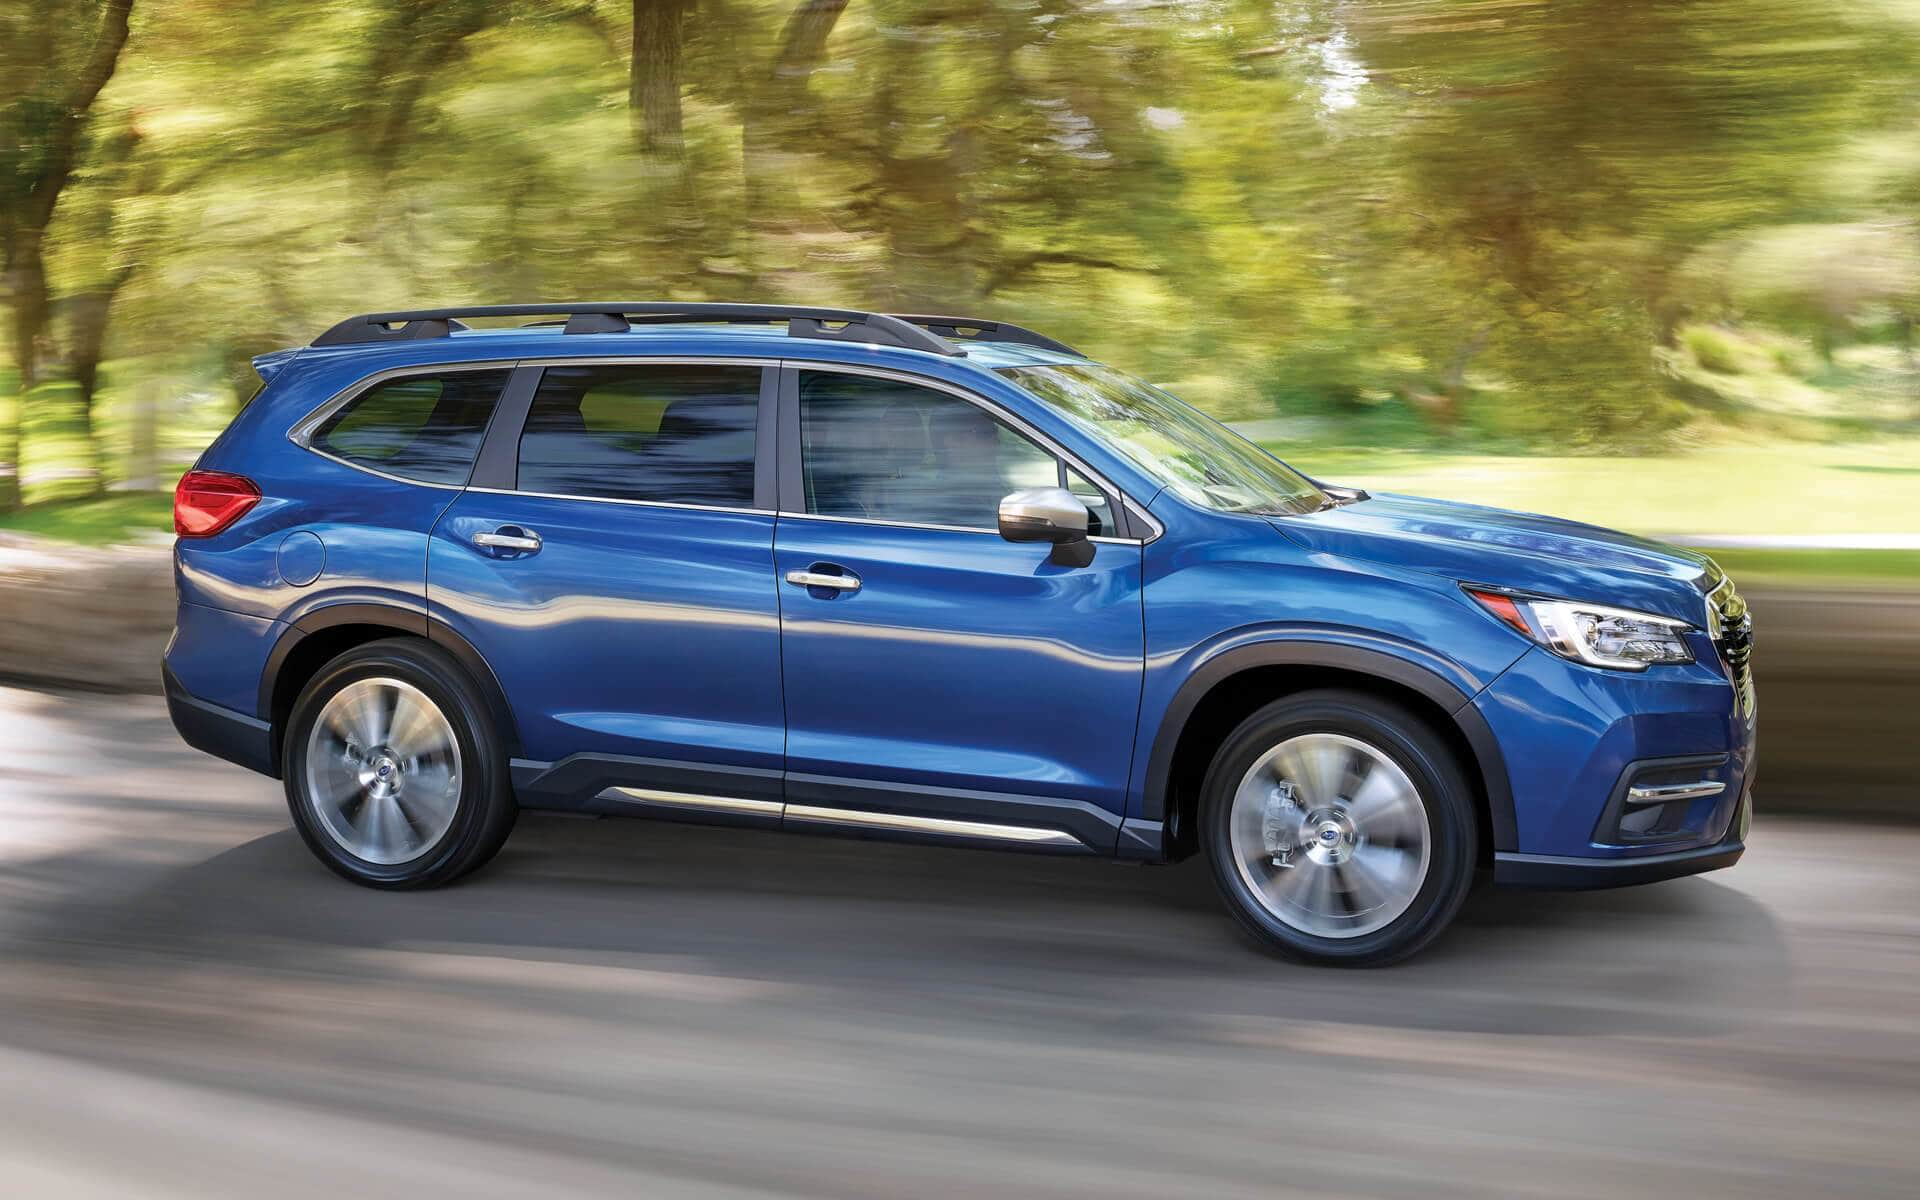 77 Best Review 2020 Subaru Ascent Exterior Exterior Research New by 2020 Subaru Ascent Exterior Exterior